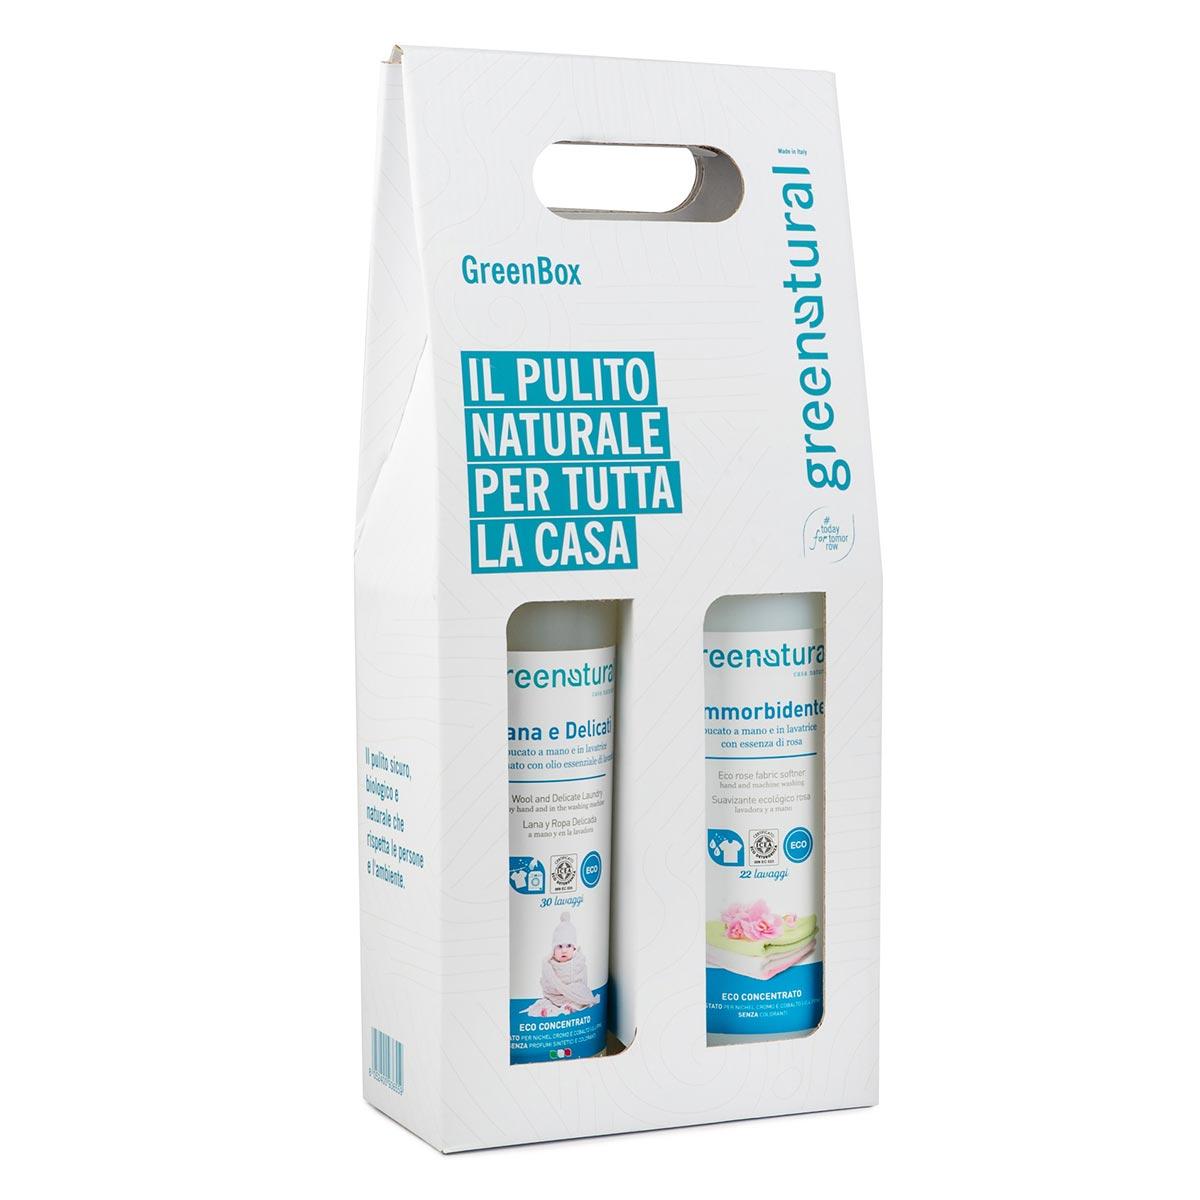 GreenBox – Ecoregalo Greenatural 2pz